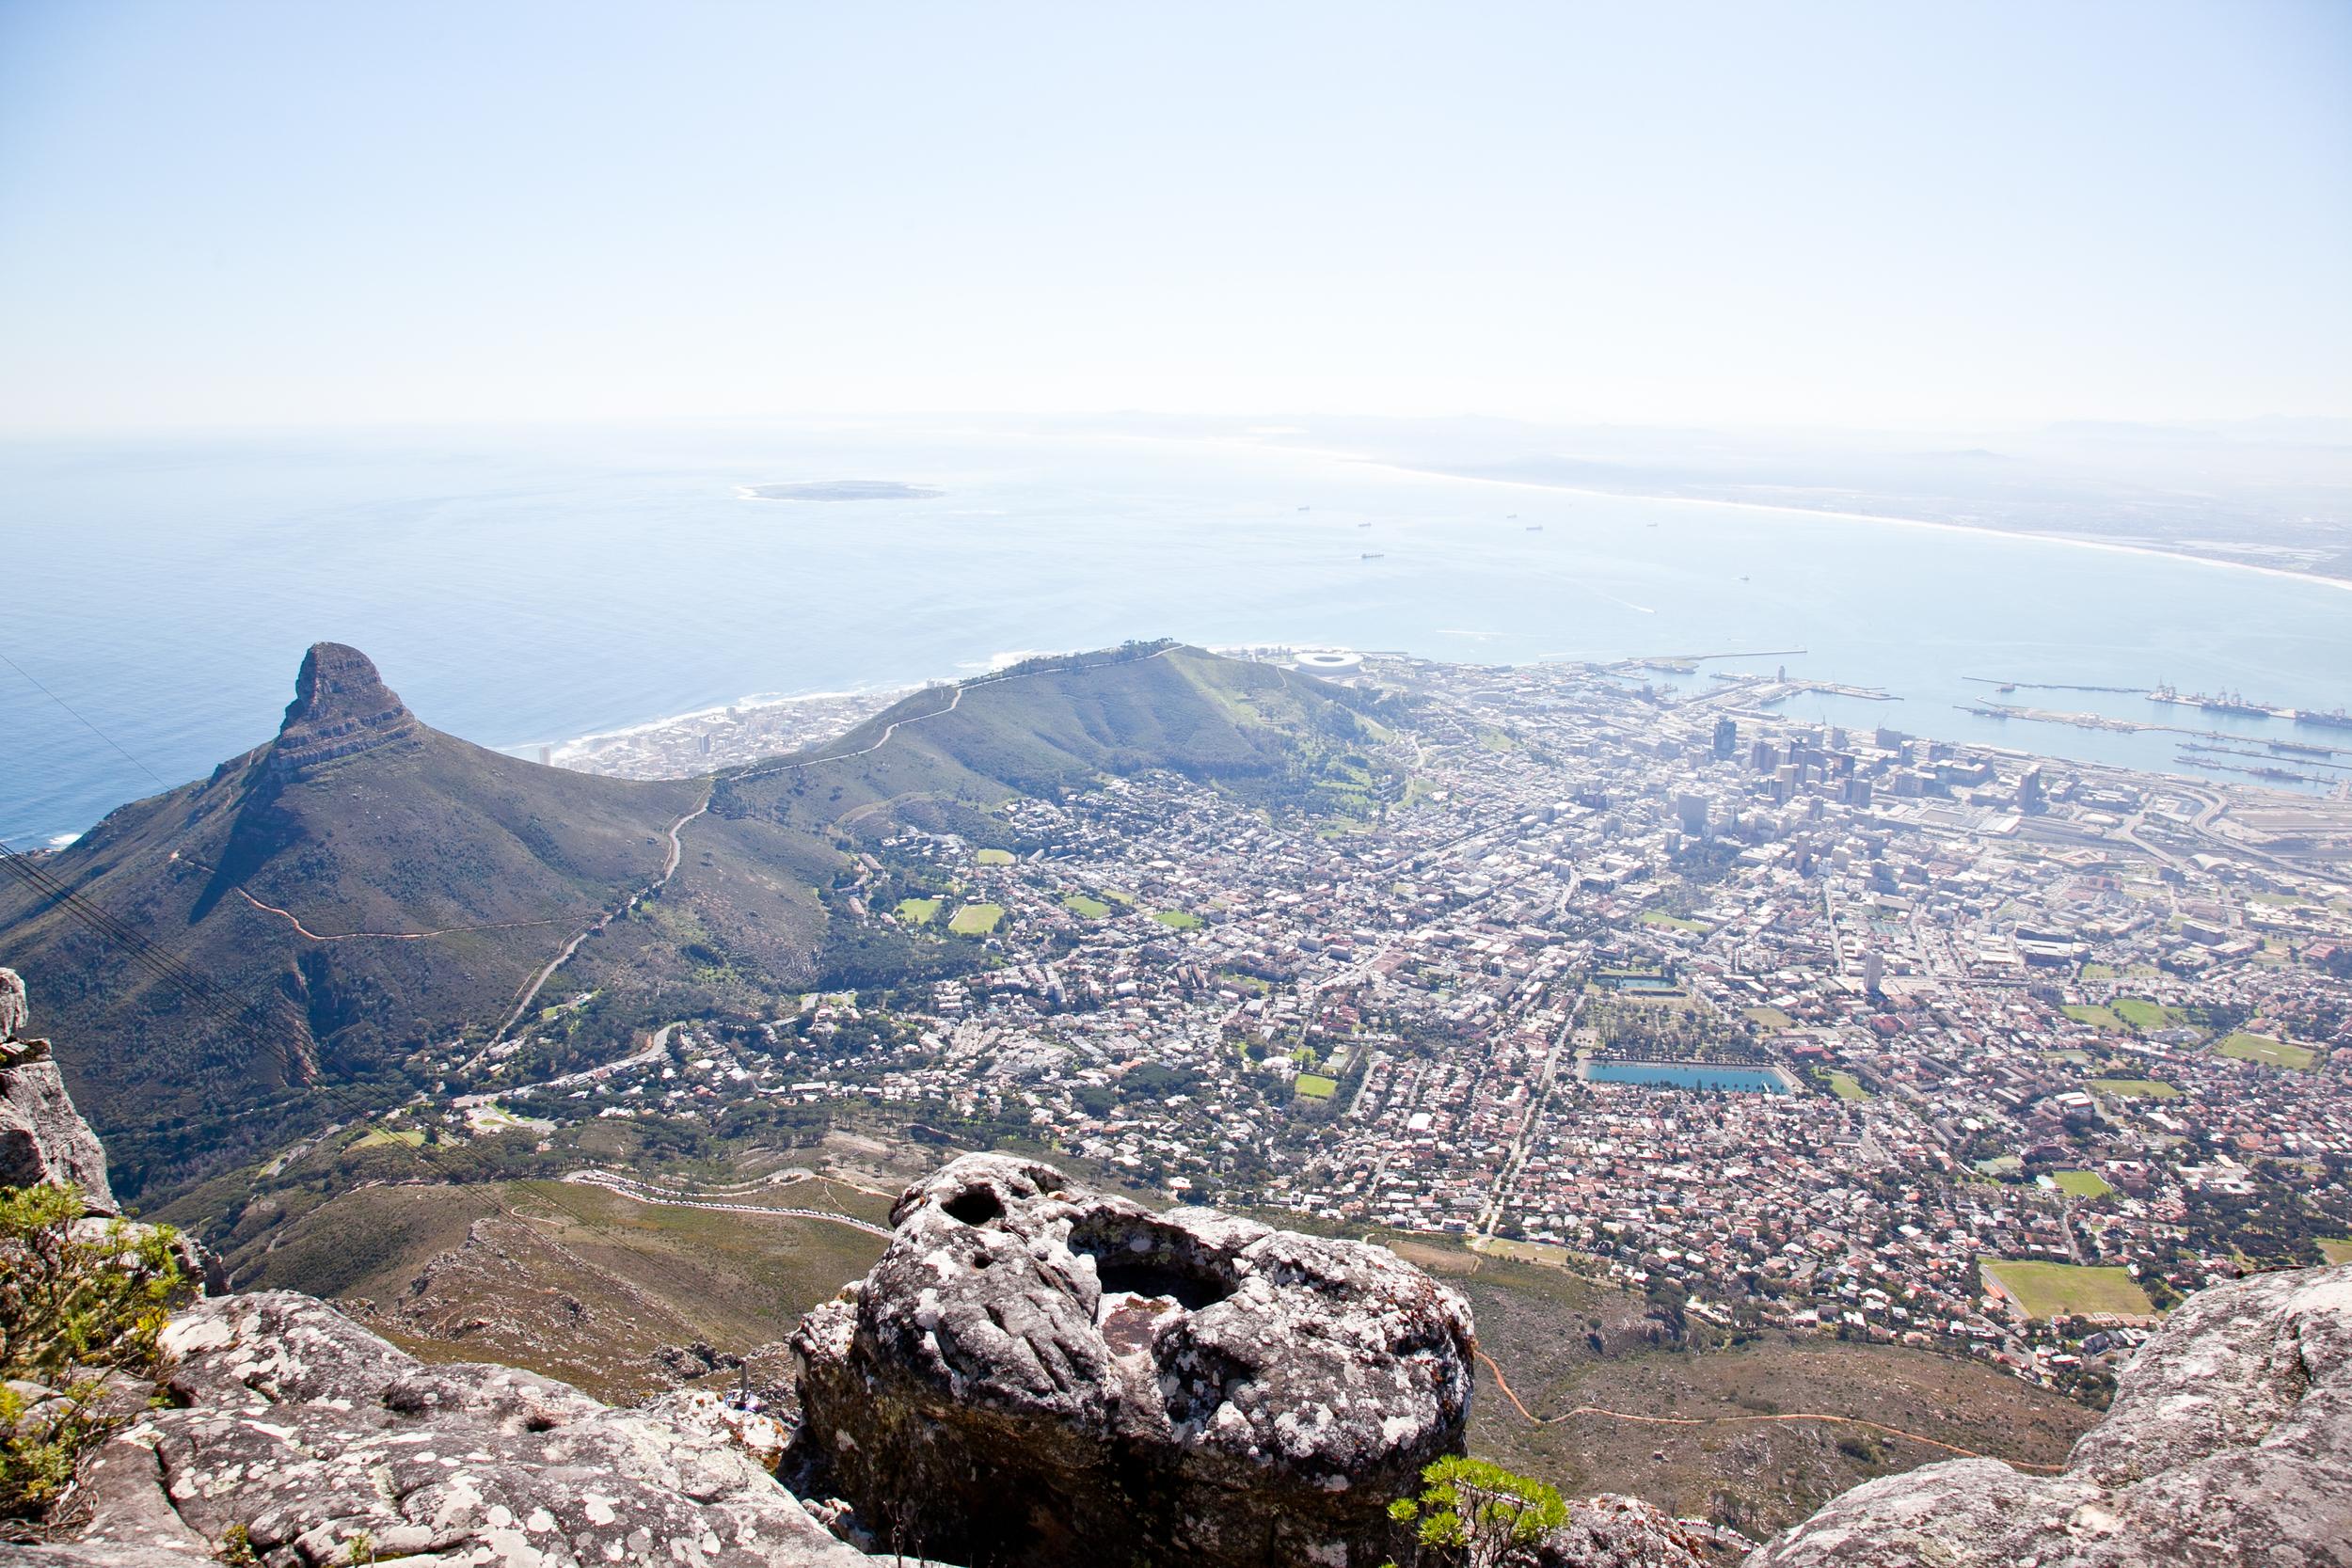 IMG_4665-table-mountain-cape-town-south-africa-trisa-taro.jpg